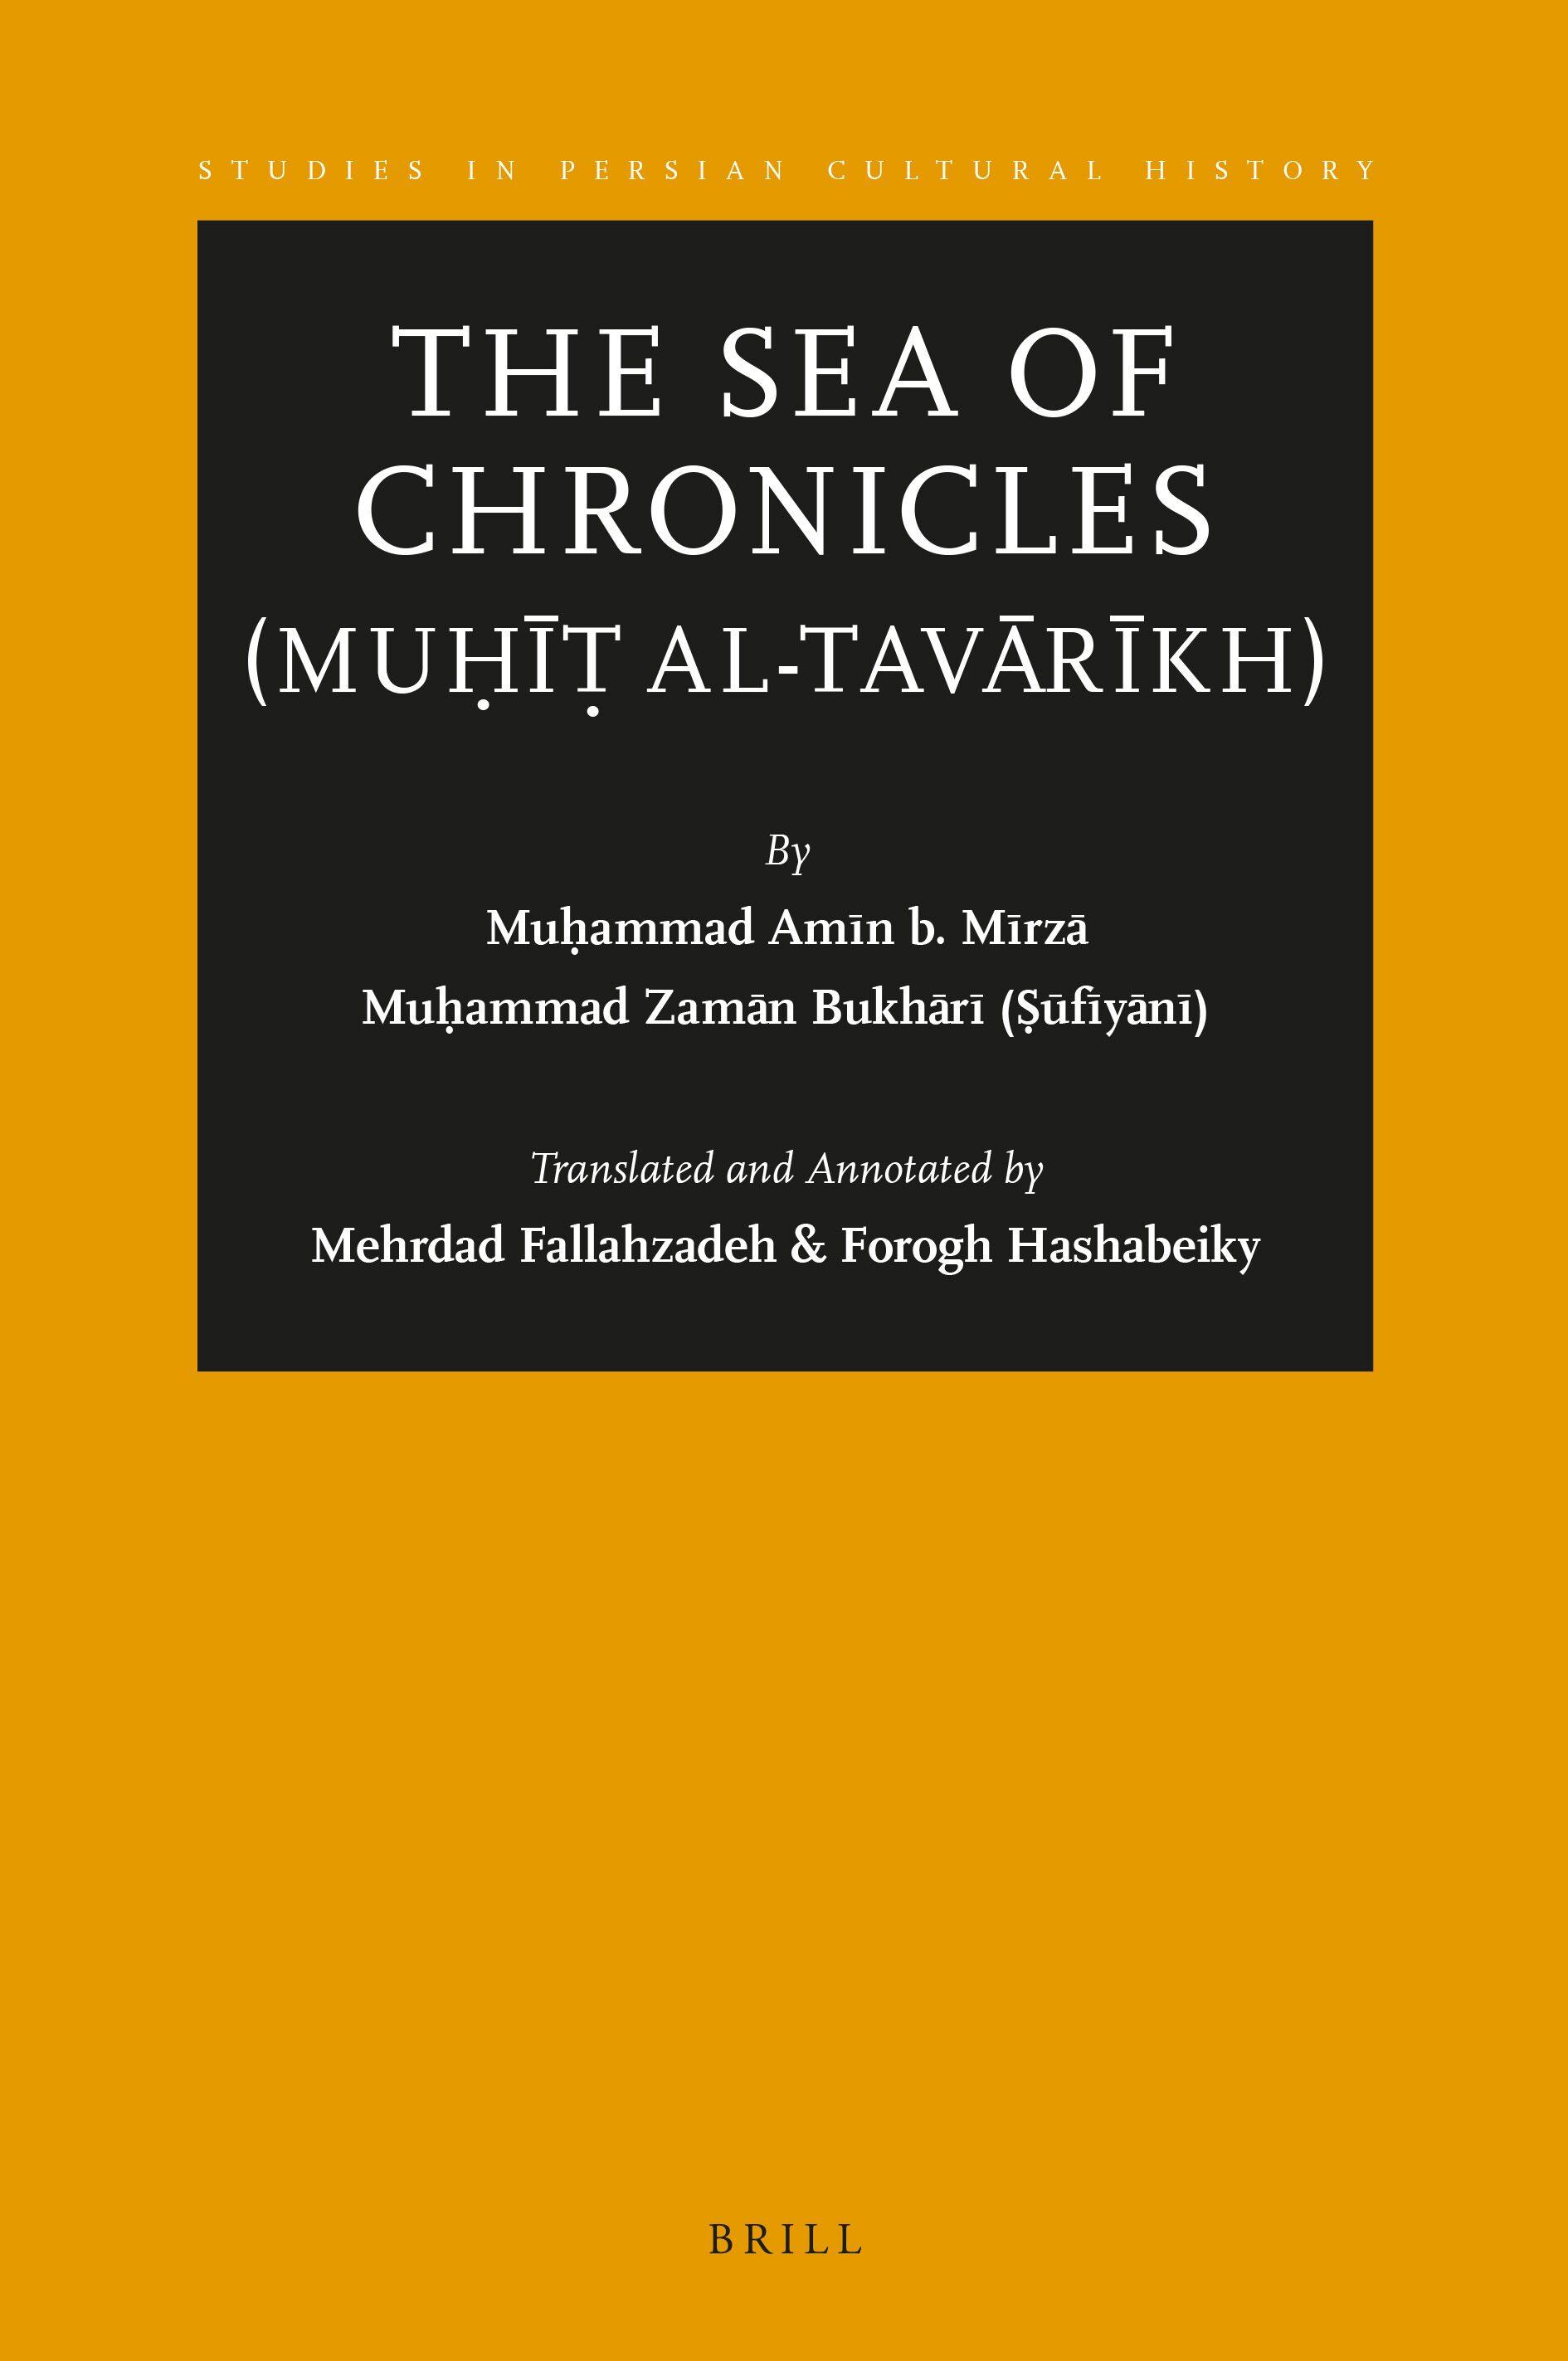 20] Chapter 20 in The Sea of Chronicles Muḥīṭ al tavārīkh